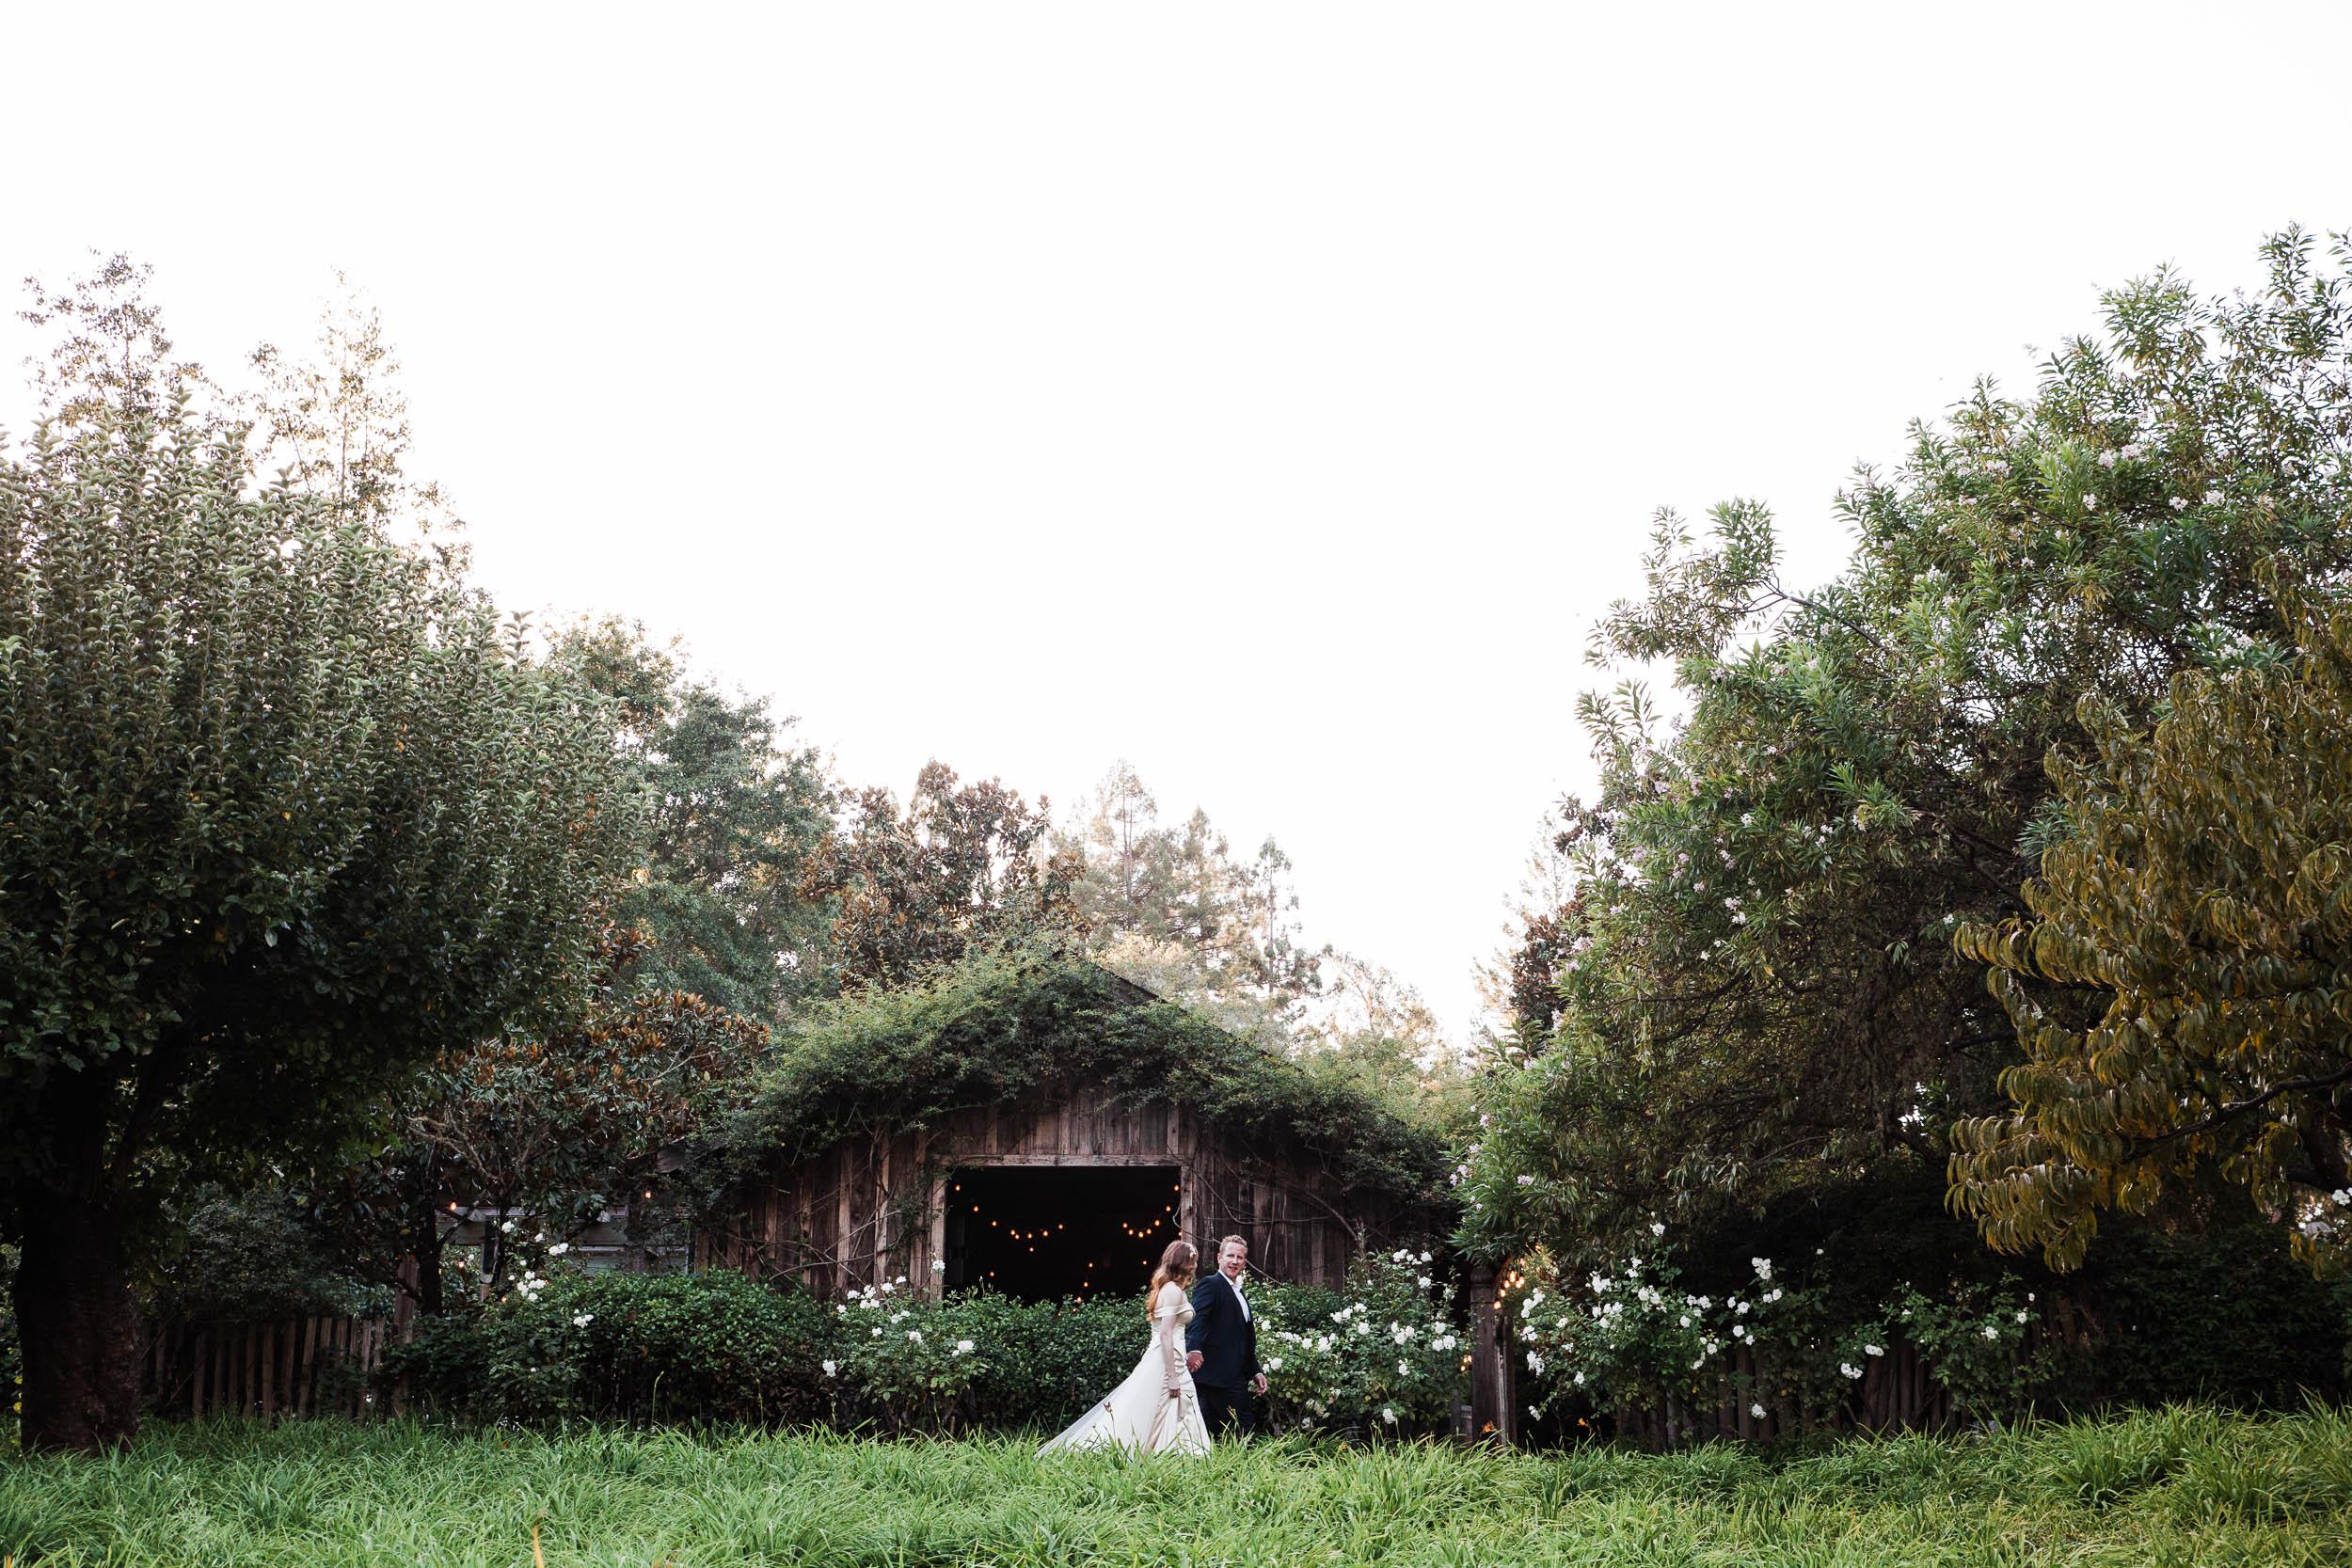 10717_A+C_Wild Iris Philo Wedding_Buena Lane Photography_1863ER.jpg